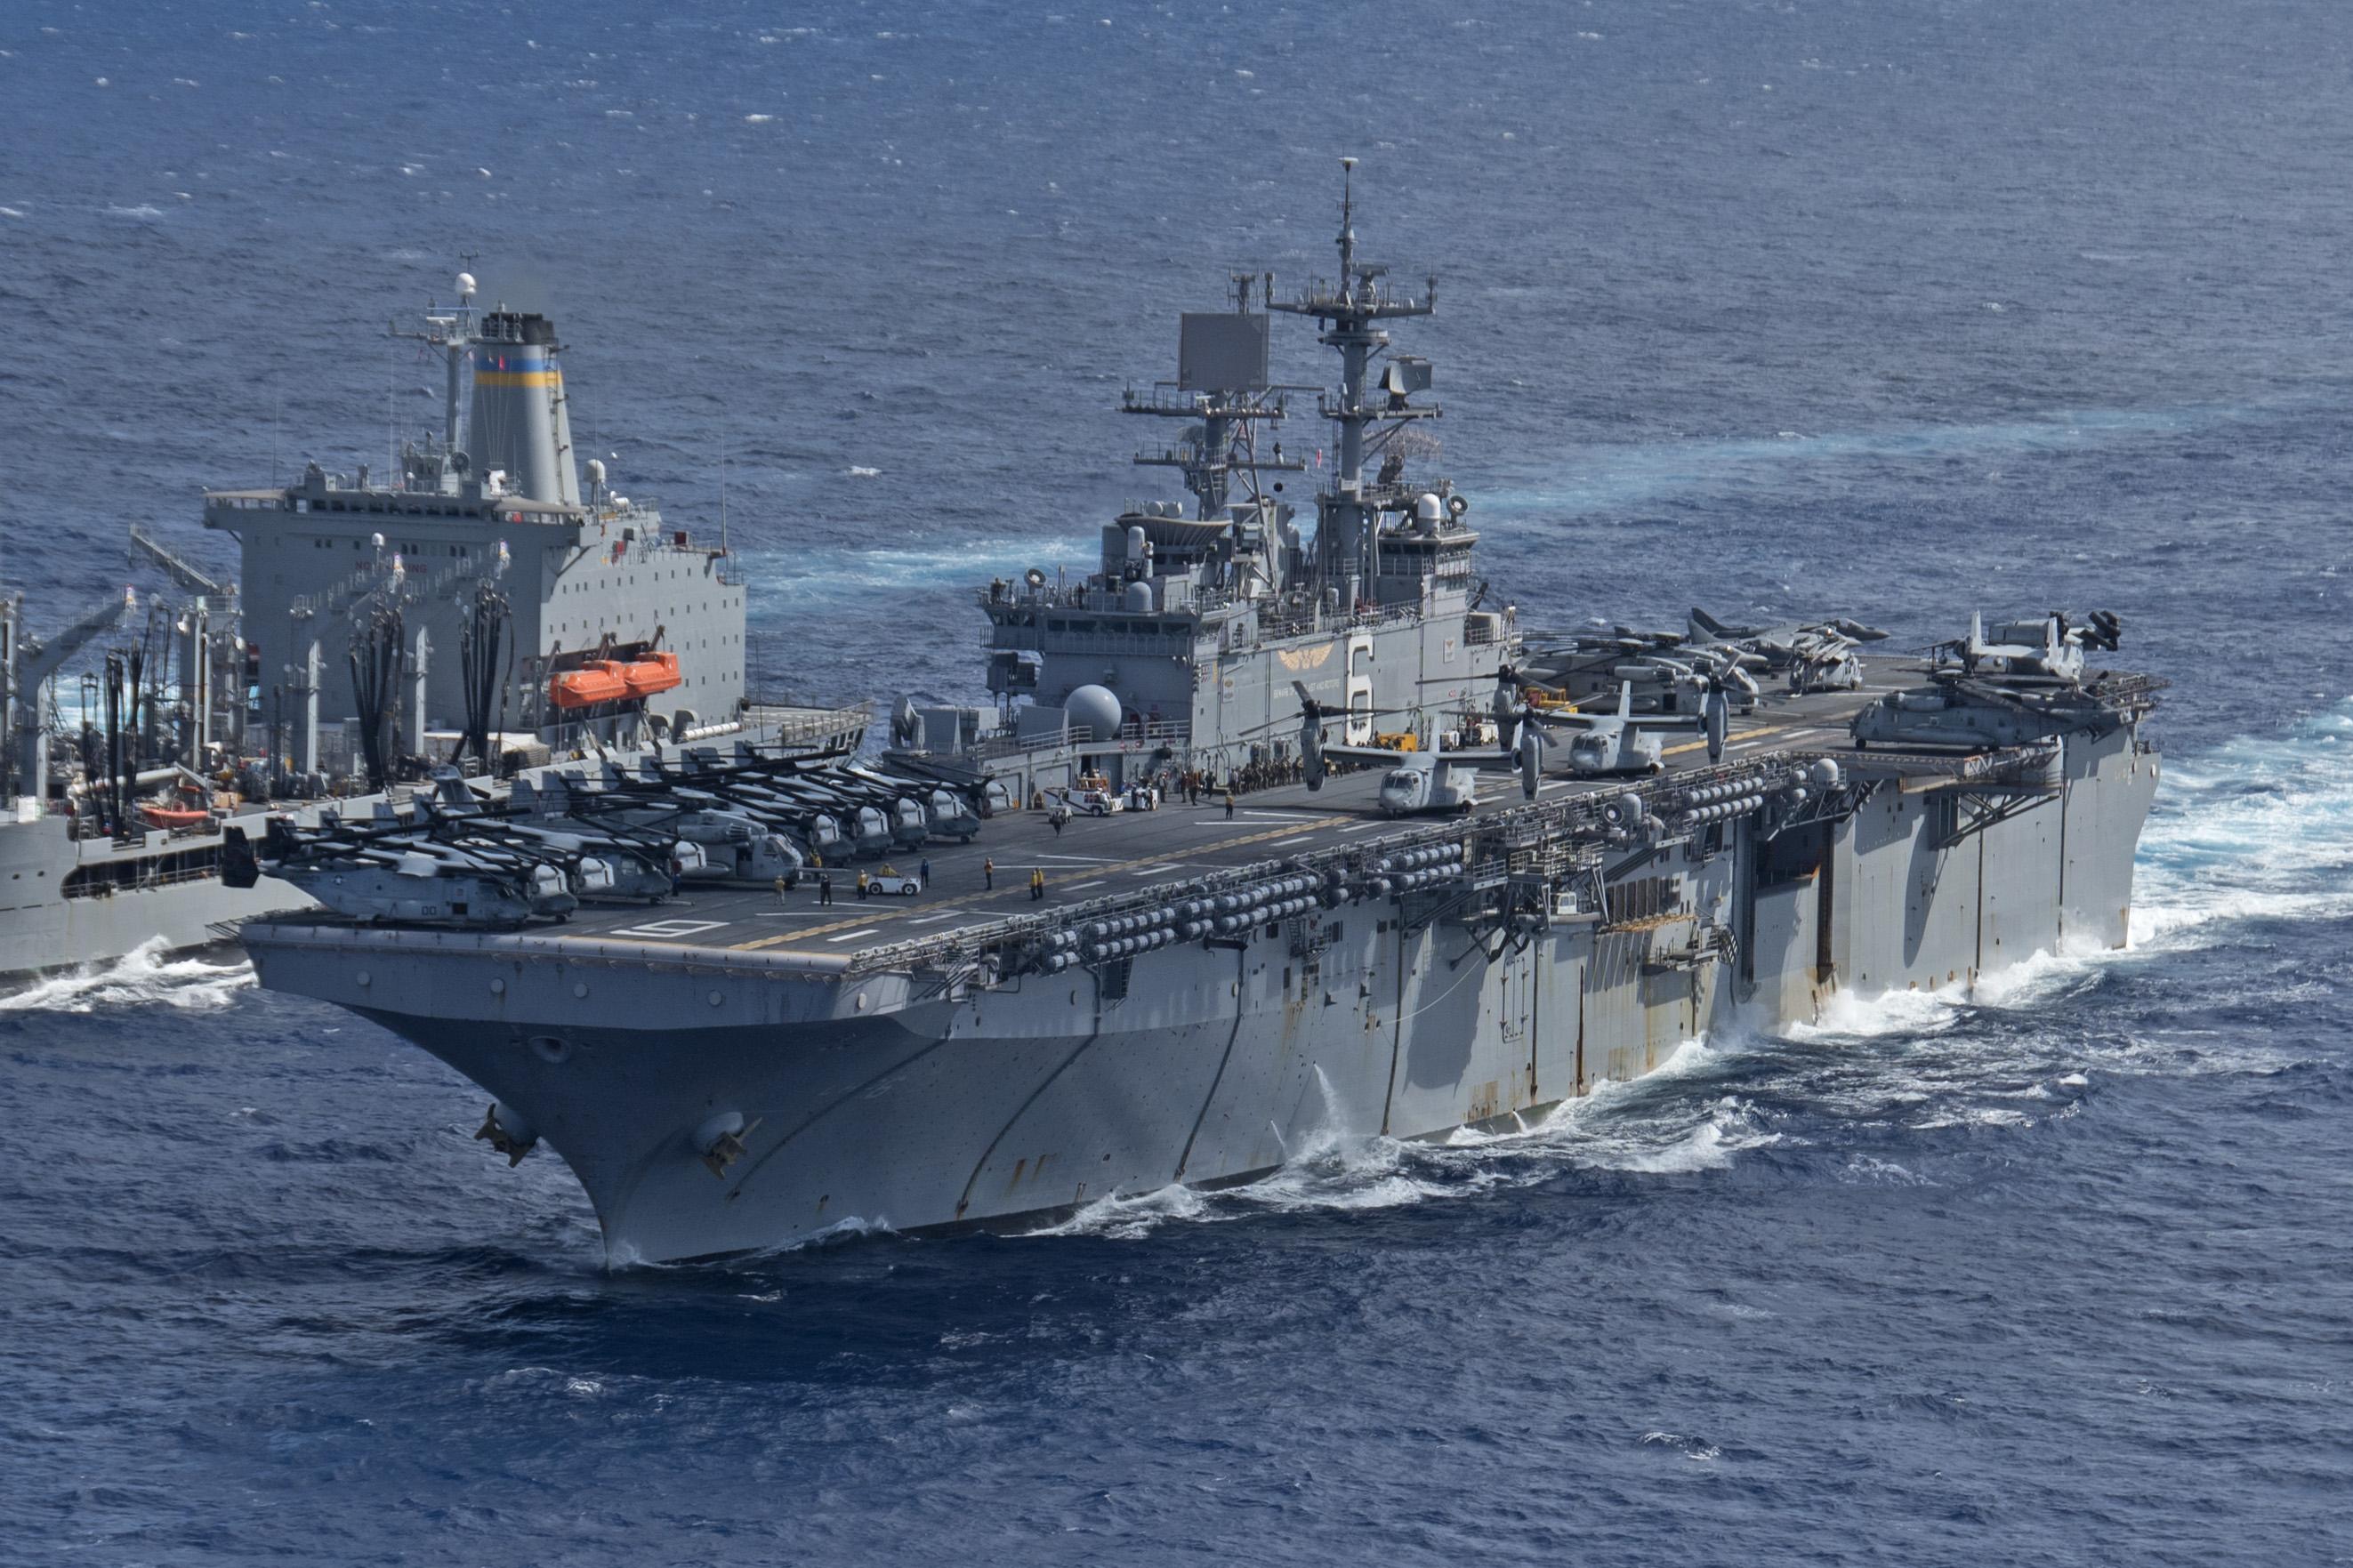 Amphibious assault ship (LHA - LHD - LPD) - Page 4 35929144205_9fdafb2749_o